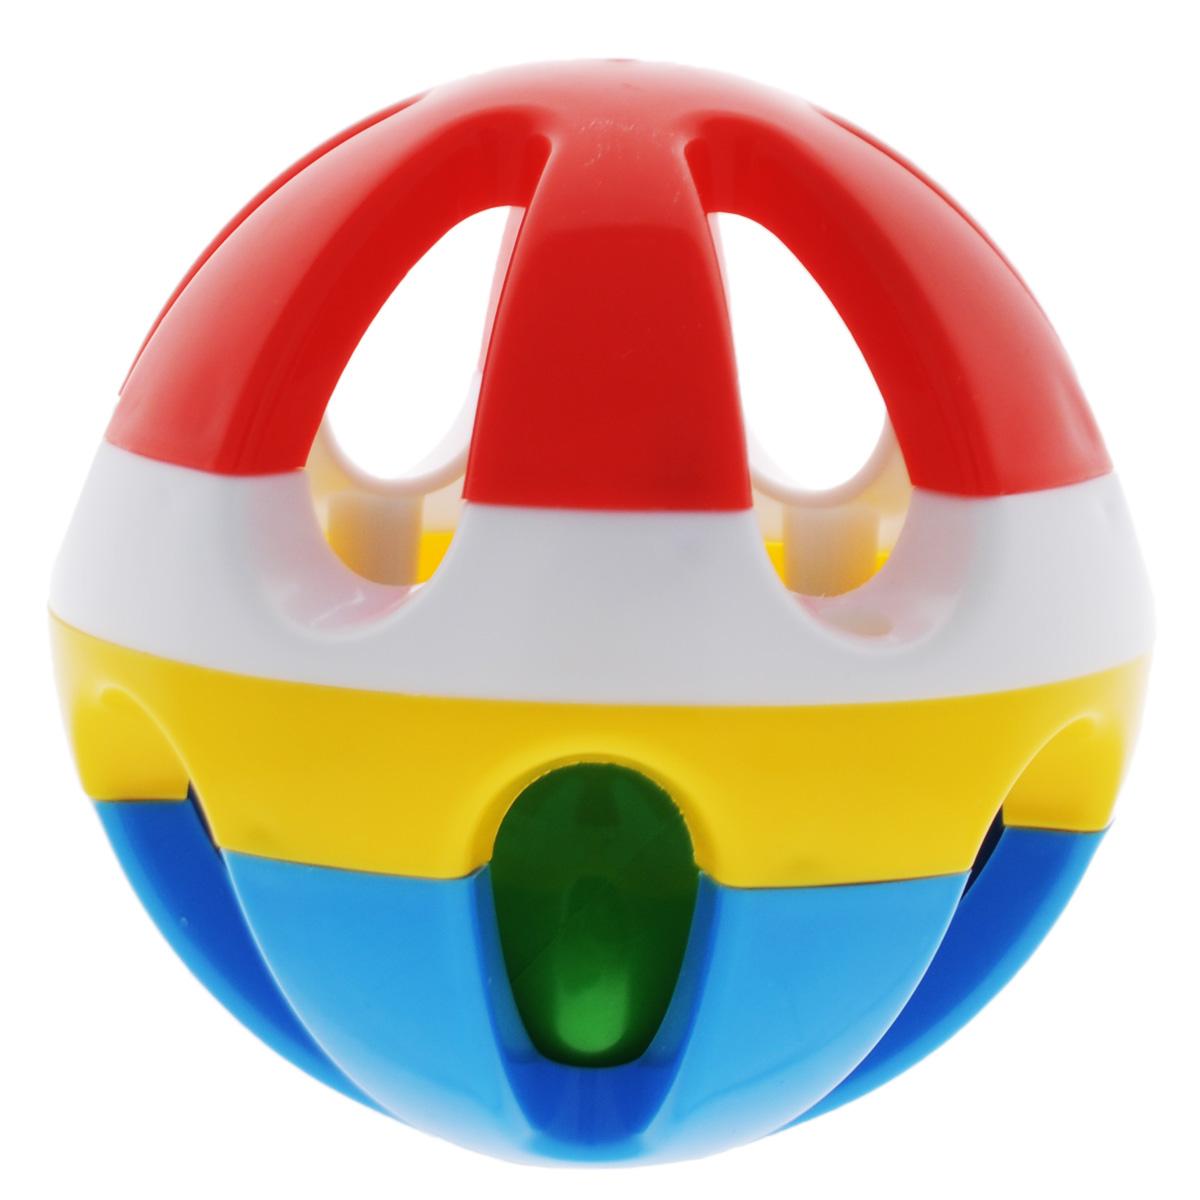 "Погремушка Stellar ""Шар"", 9 см, цвет: красный, белый, желтый, синий"